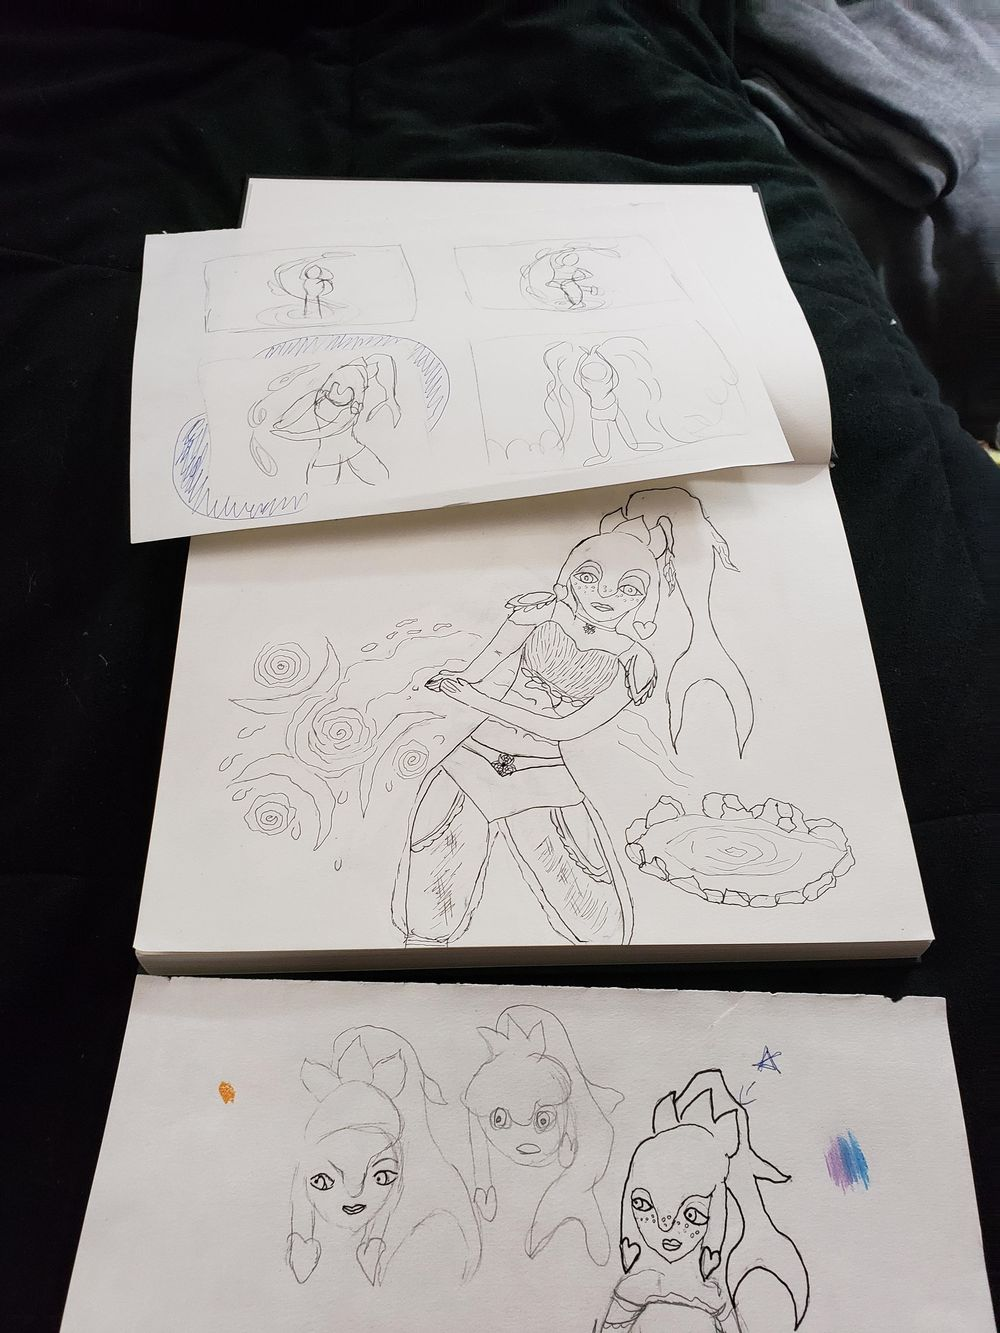 Zora Princess - image 3 - student project